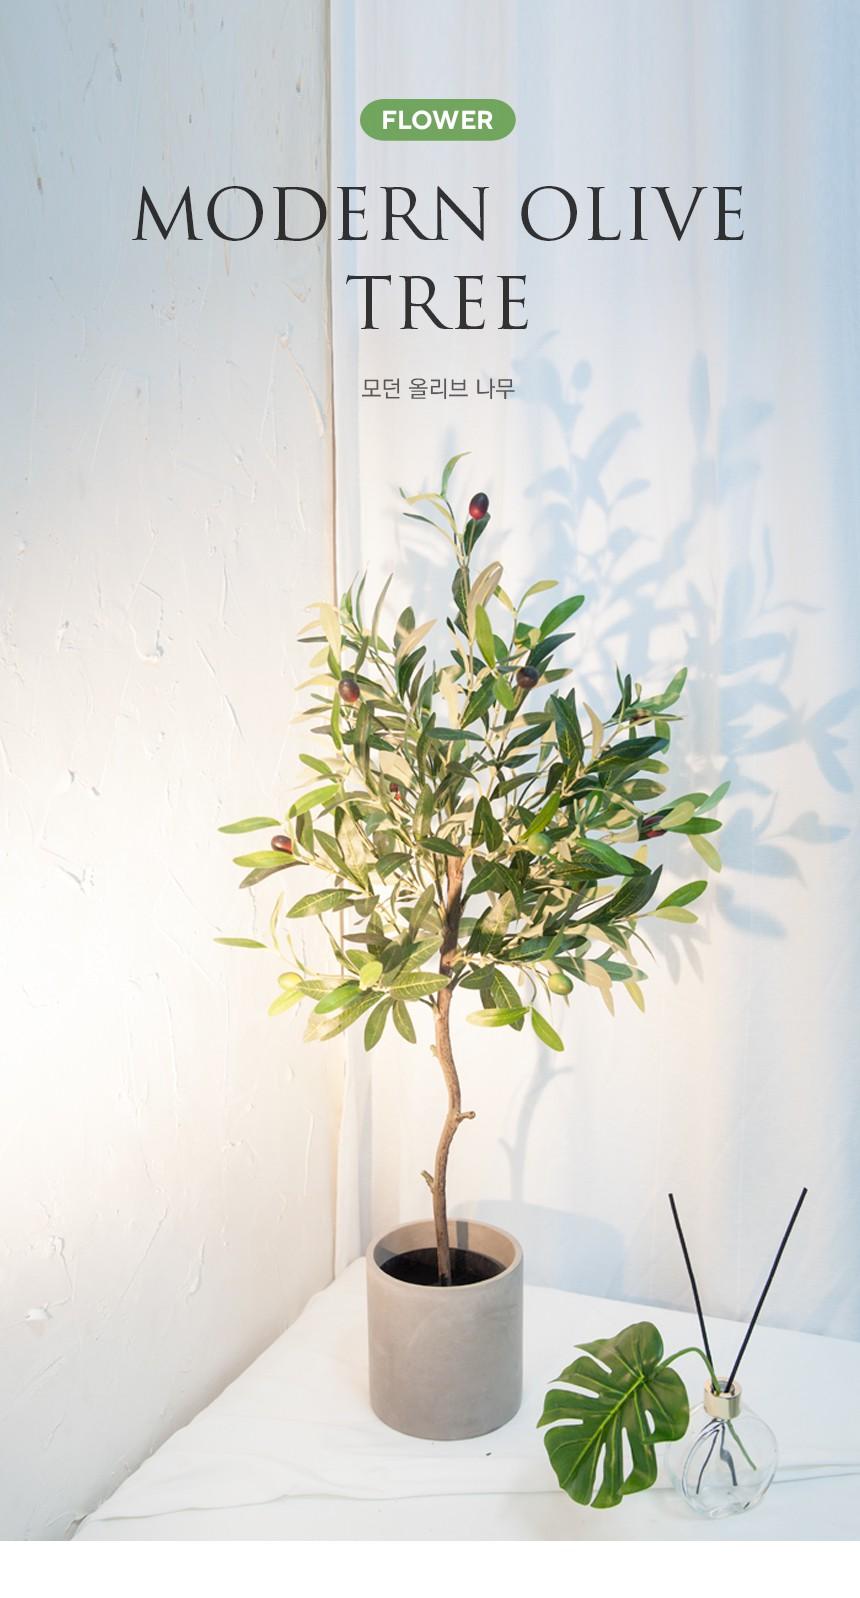 MODERN-OLIVE-TREE_01.jpg